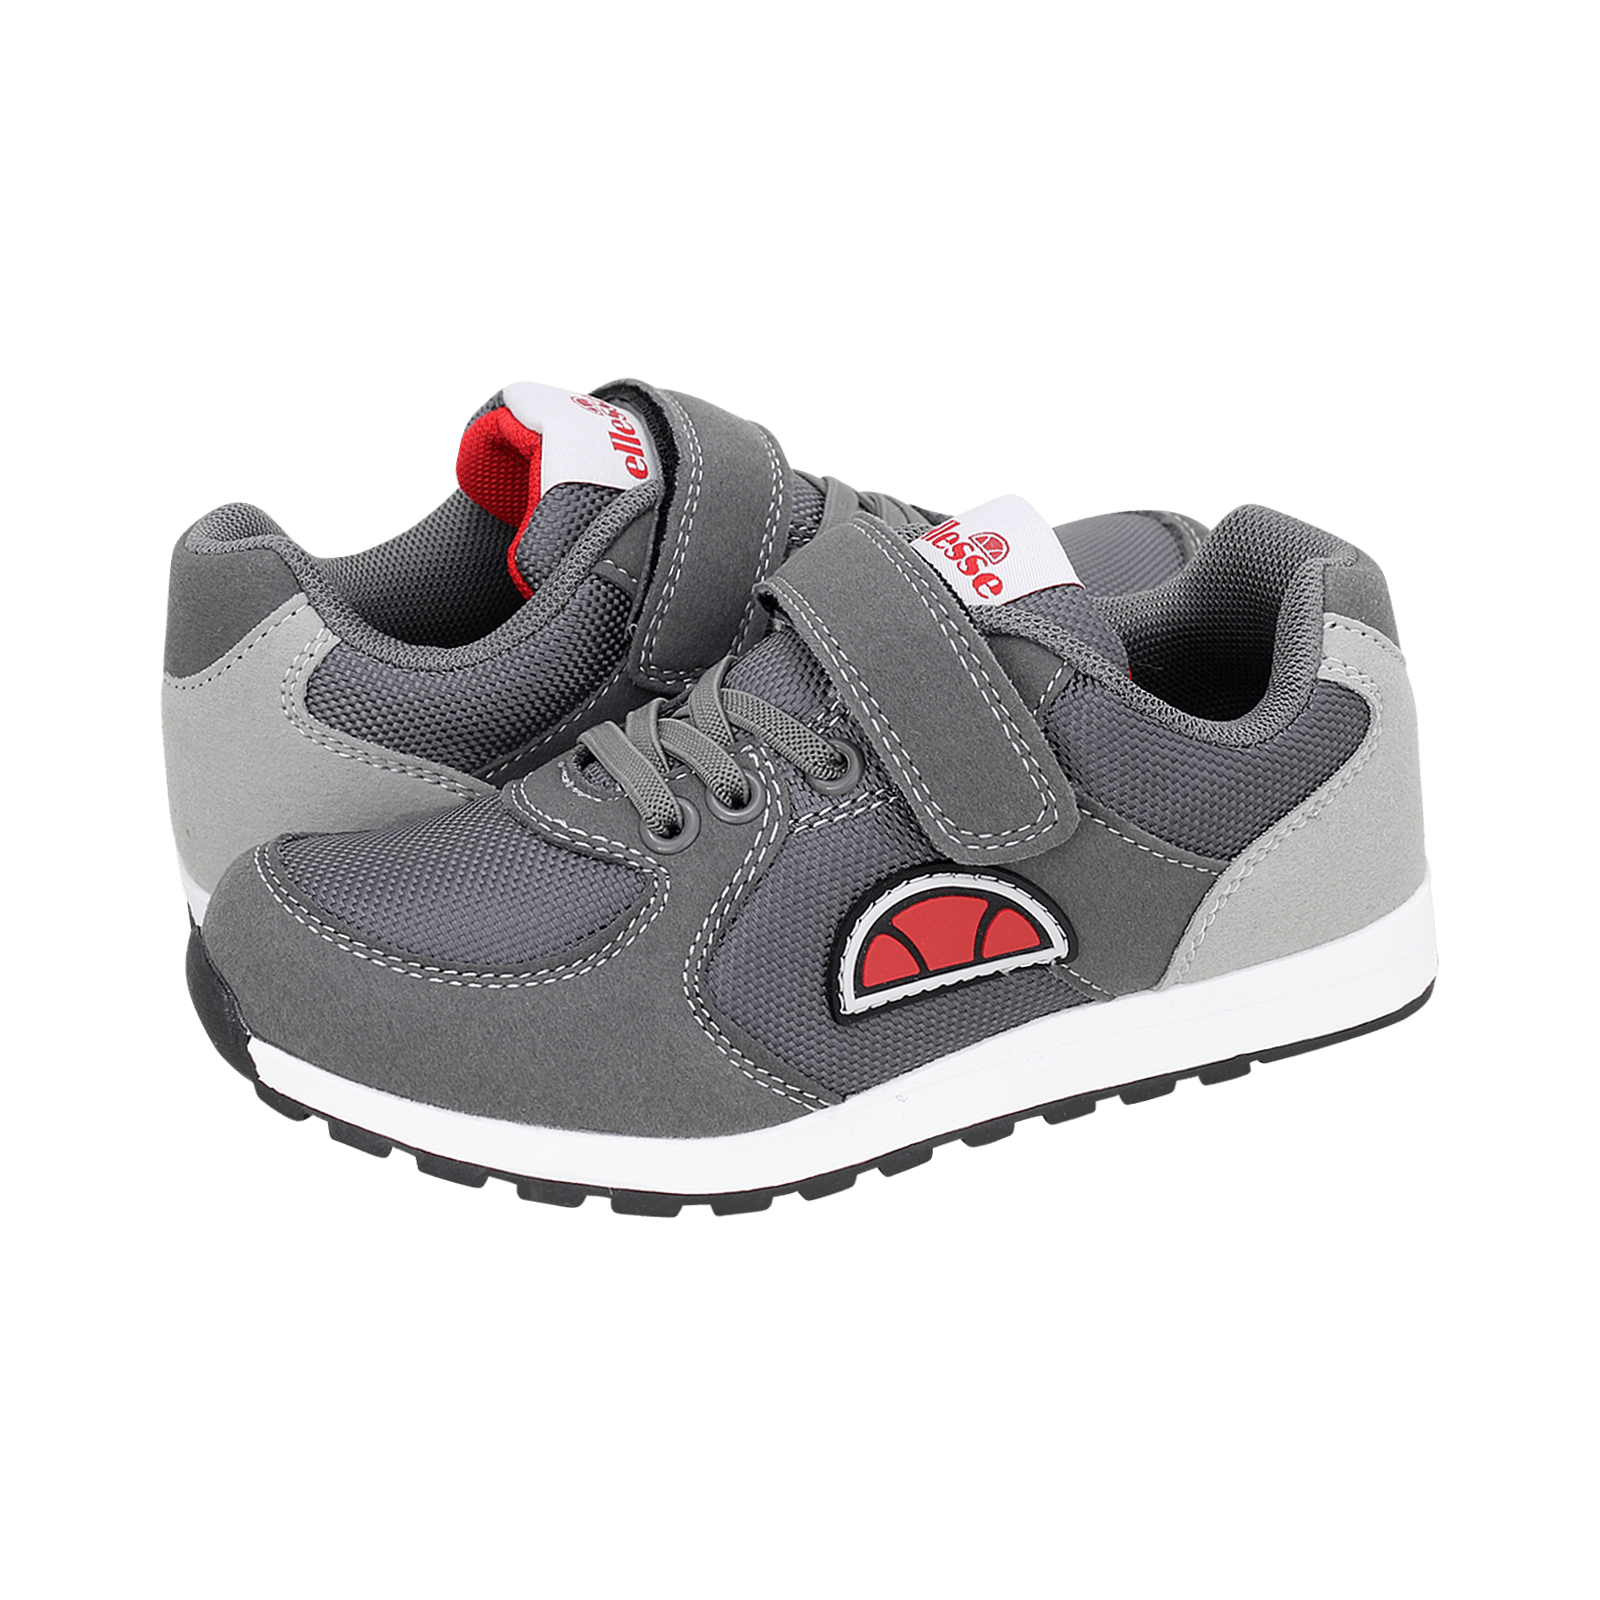 5cf644f5fba Αθλητικά Παιδικά Παπούτσια Ellesse HB-ELS07